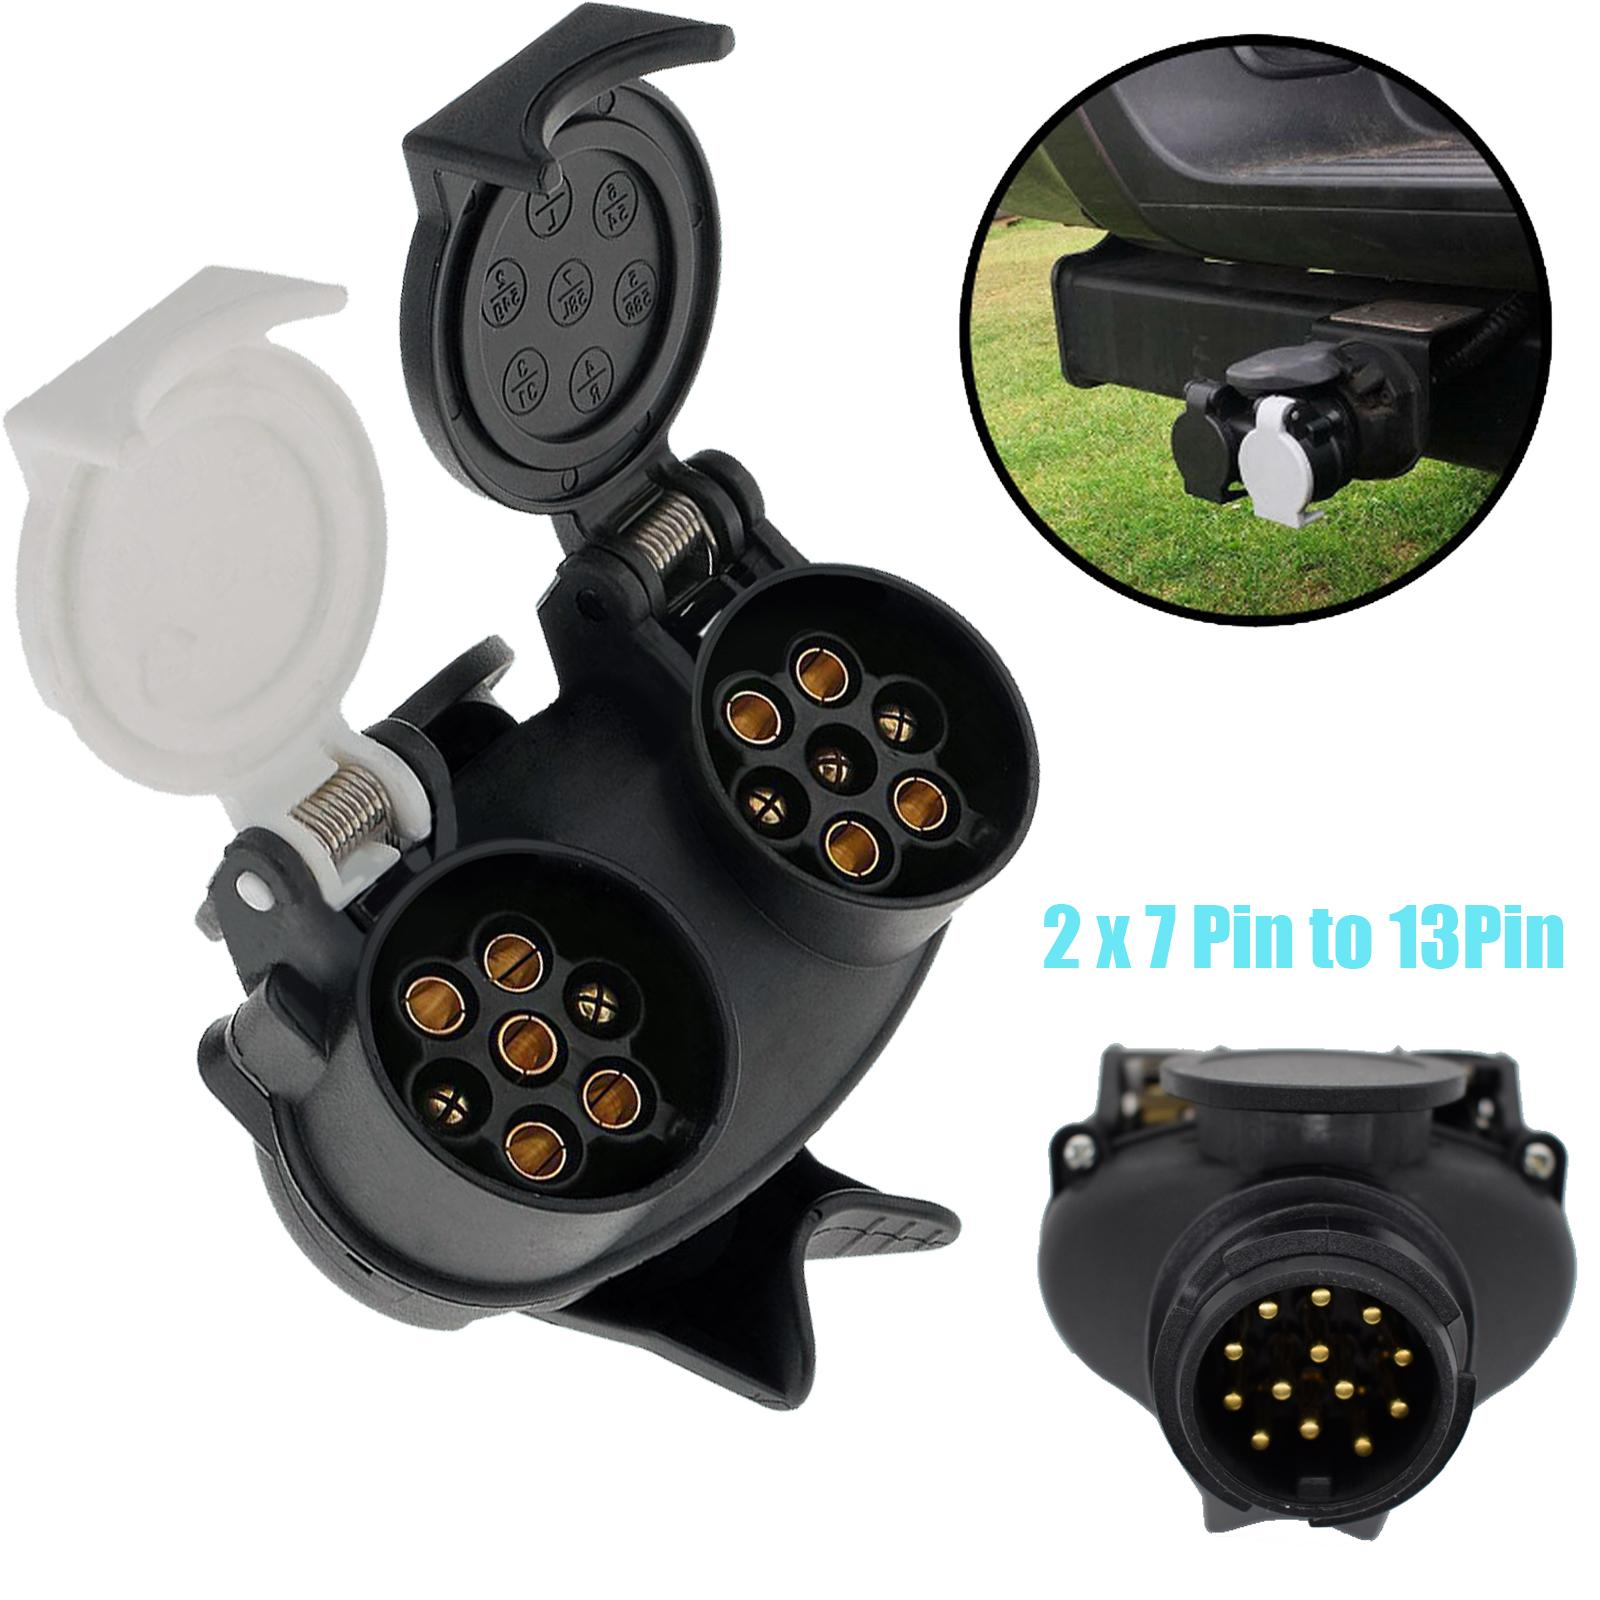 13 Pin To 7 Pin Double Head Trailer Socket Towing Plug Connector Caravan RV Power Plug Socket Connector Conversion Adapter